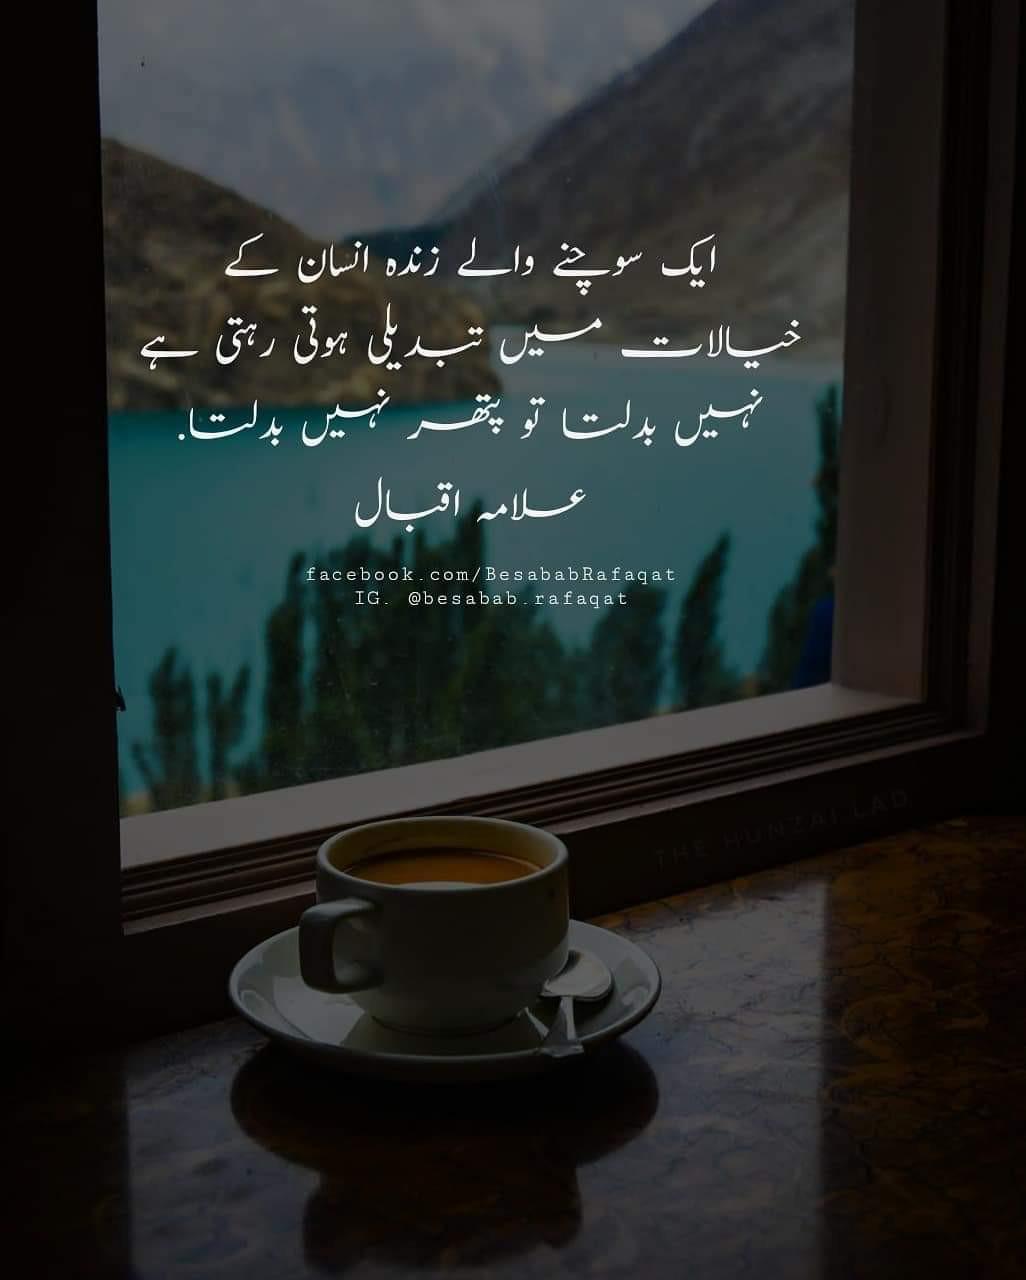 Image by BeSabab Rafaaqat